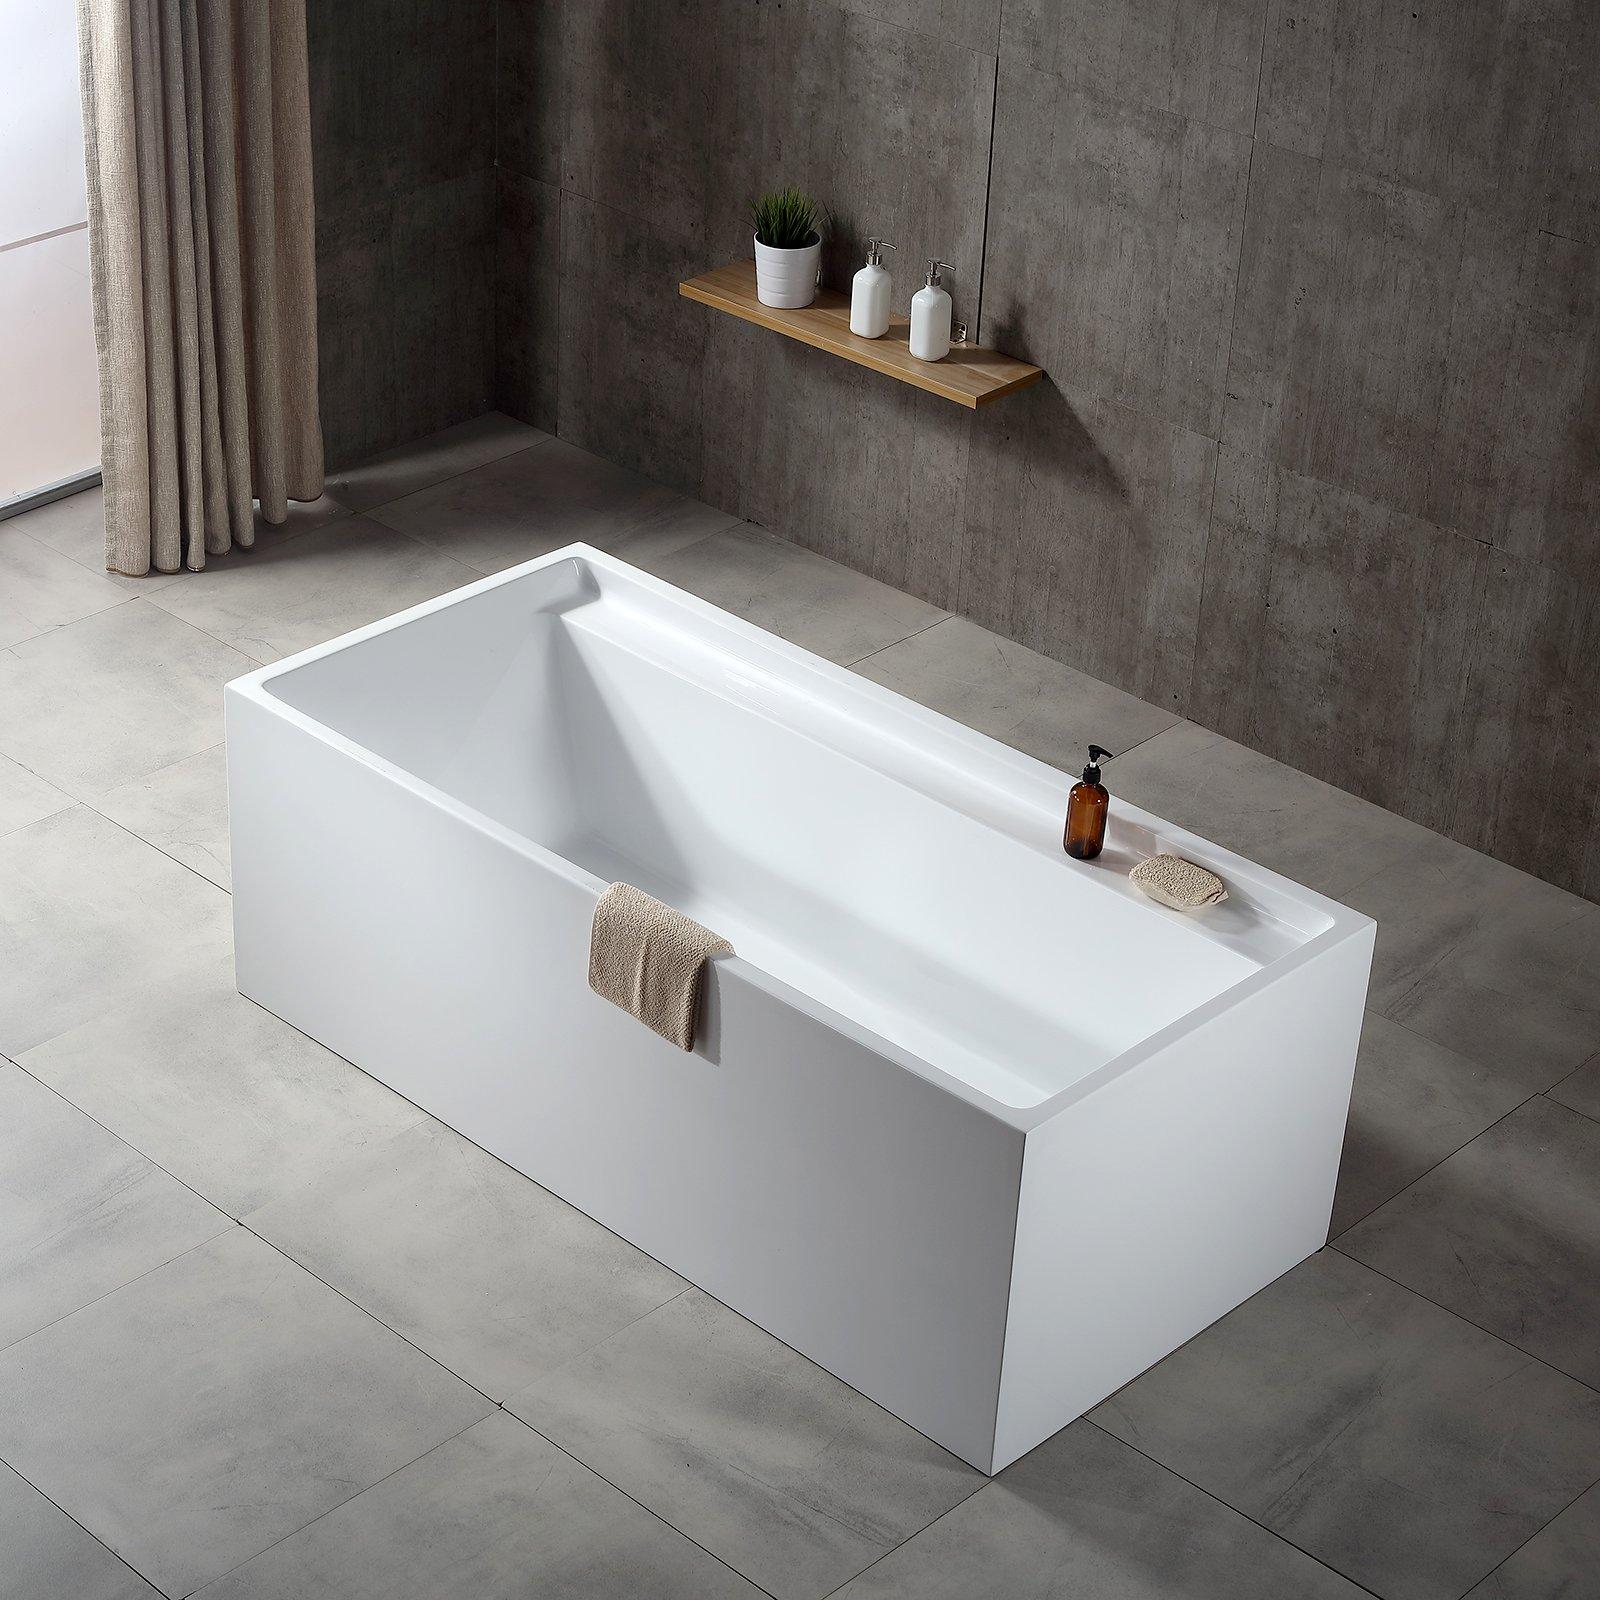 Freistehende Badewanne VERONA Acryl weiß - 170 x 80 x 60 cm - Standarmatur wählbar